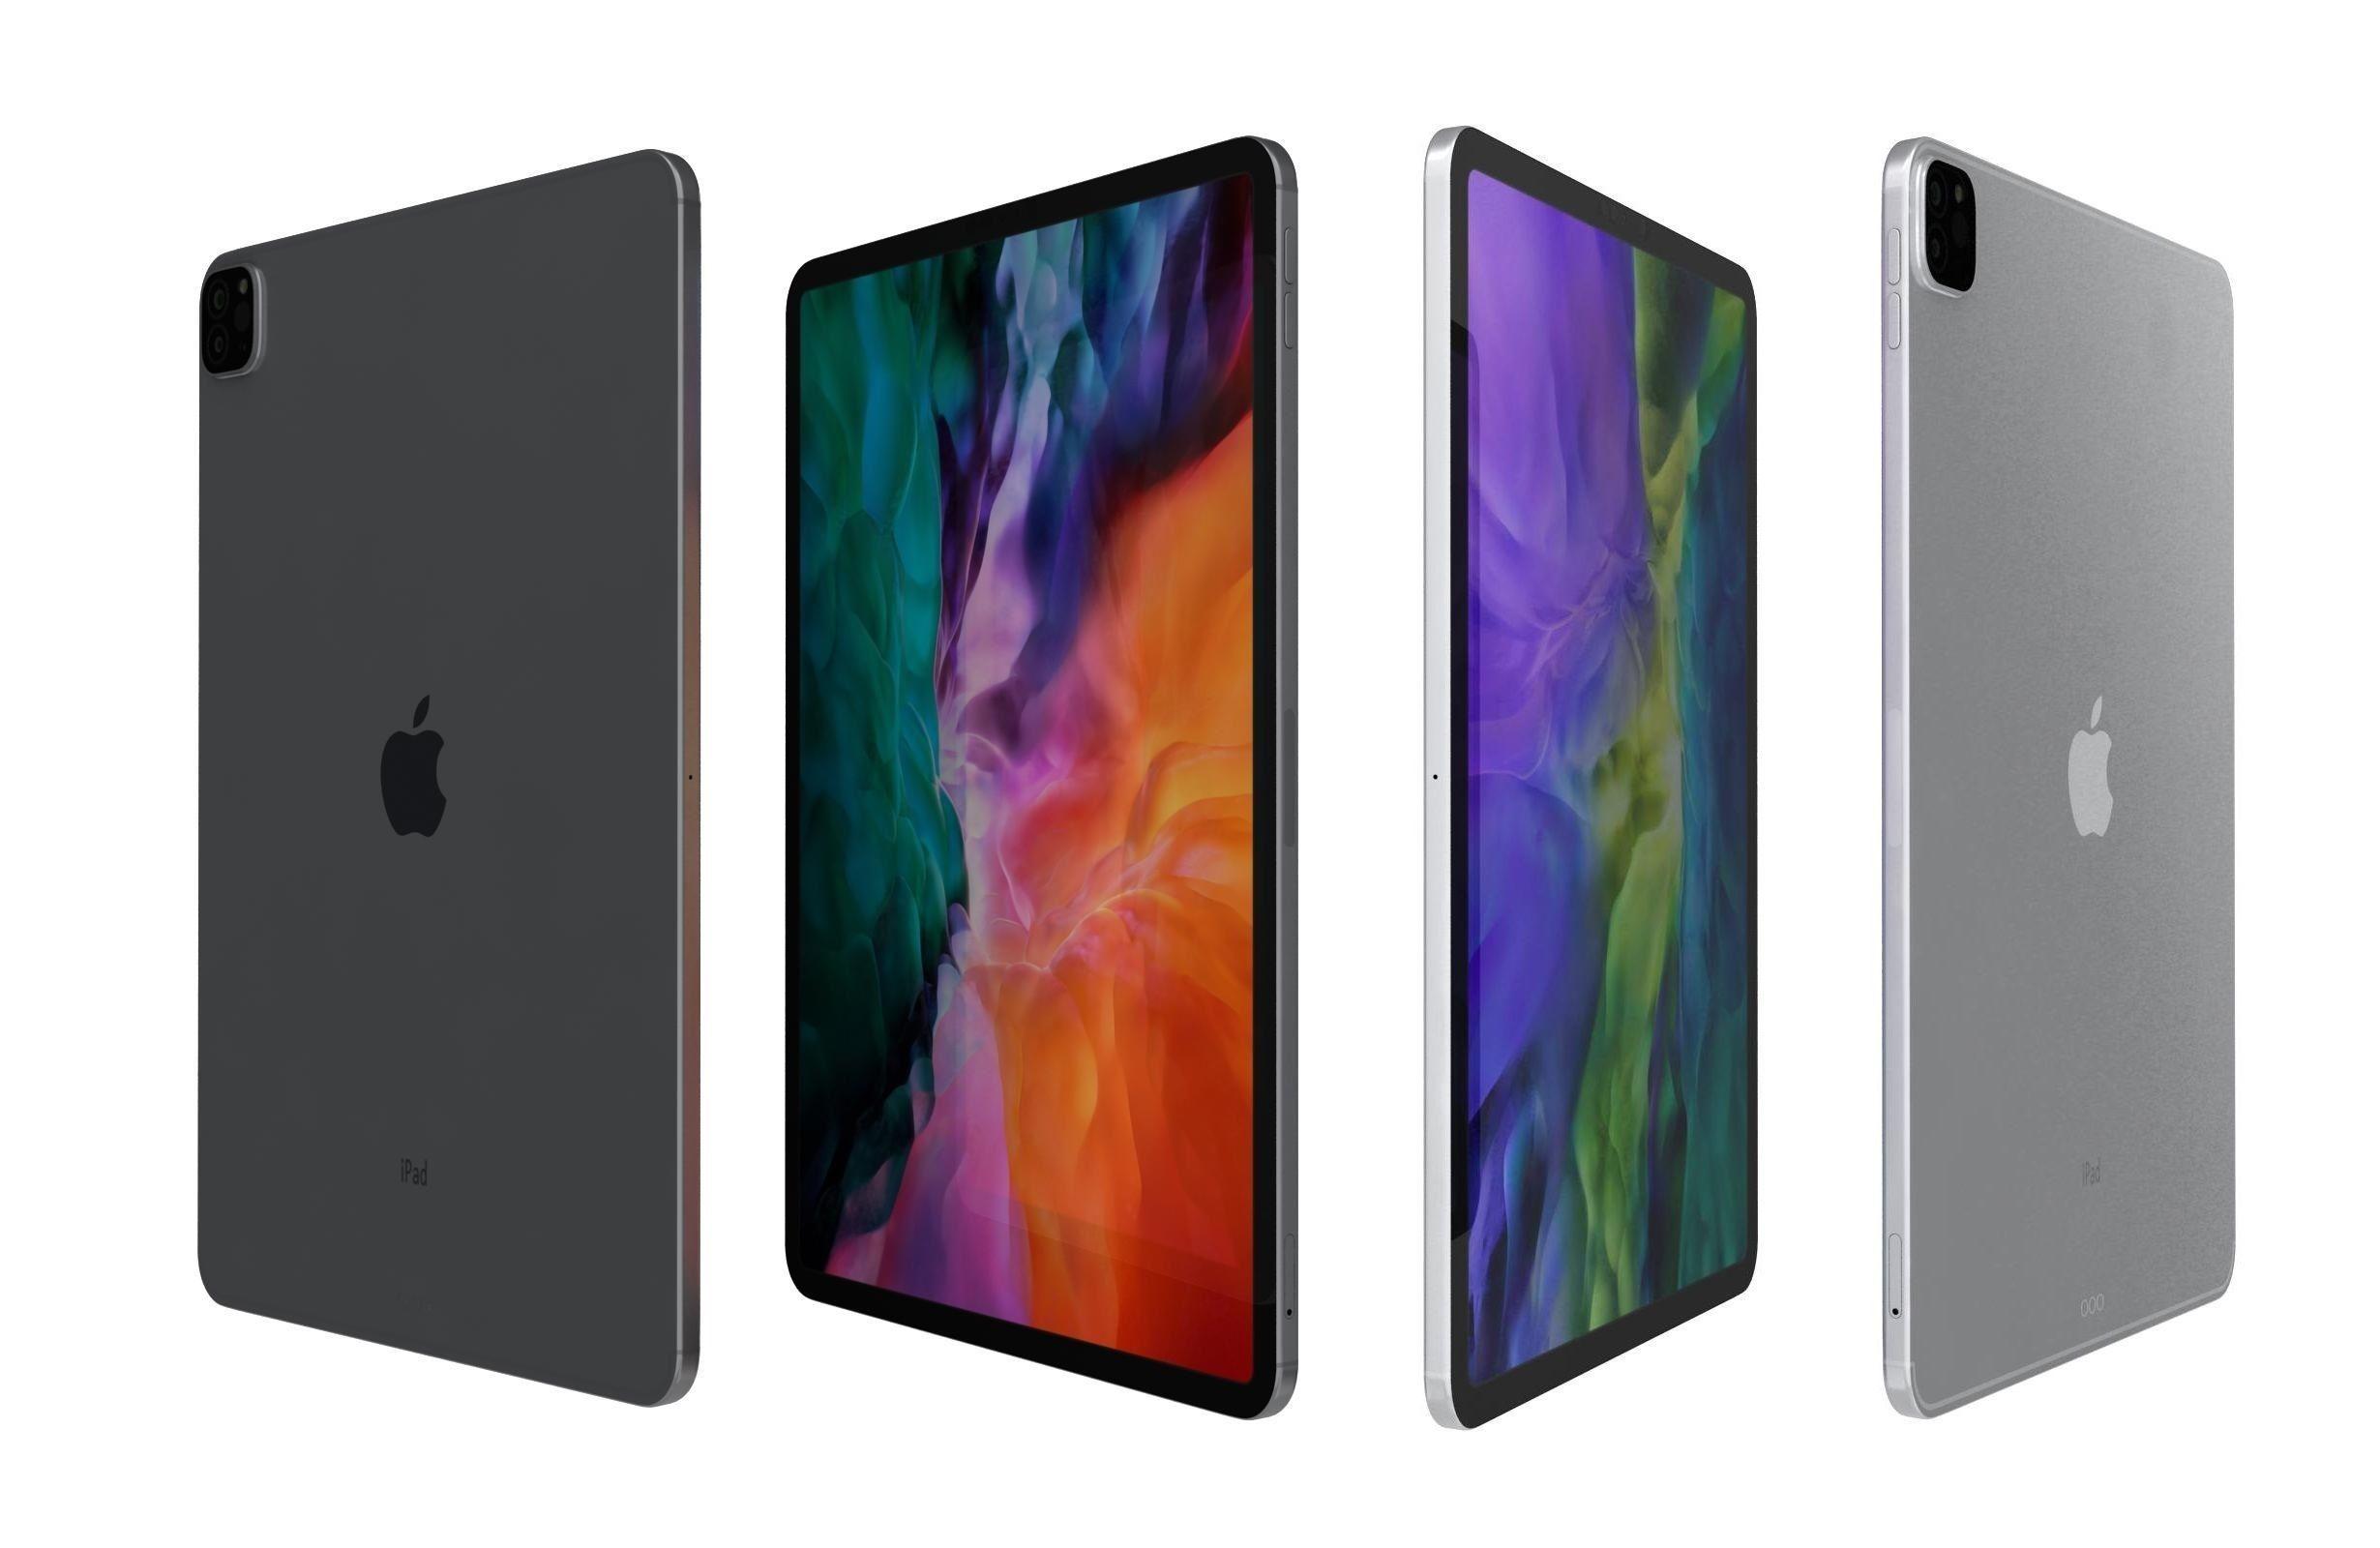 3D model Apple iPad Pro 12 9 2020 WiFi Cellular All Colors